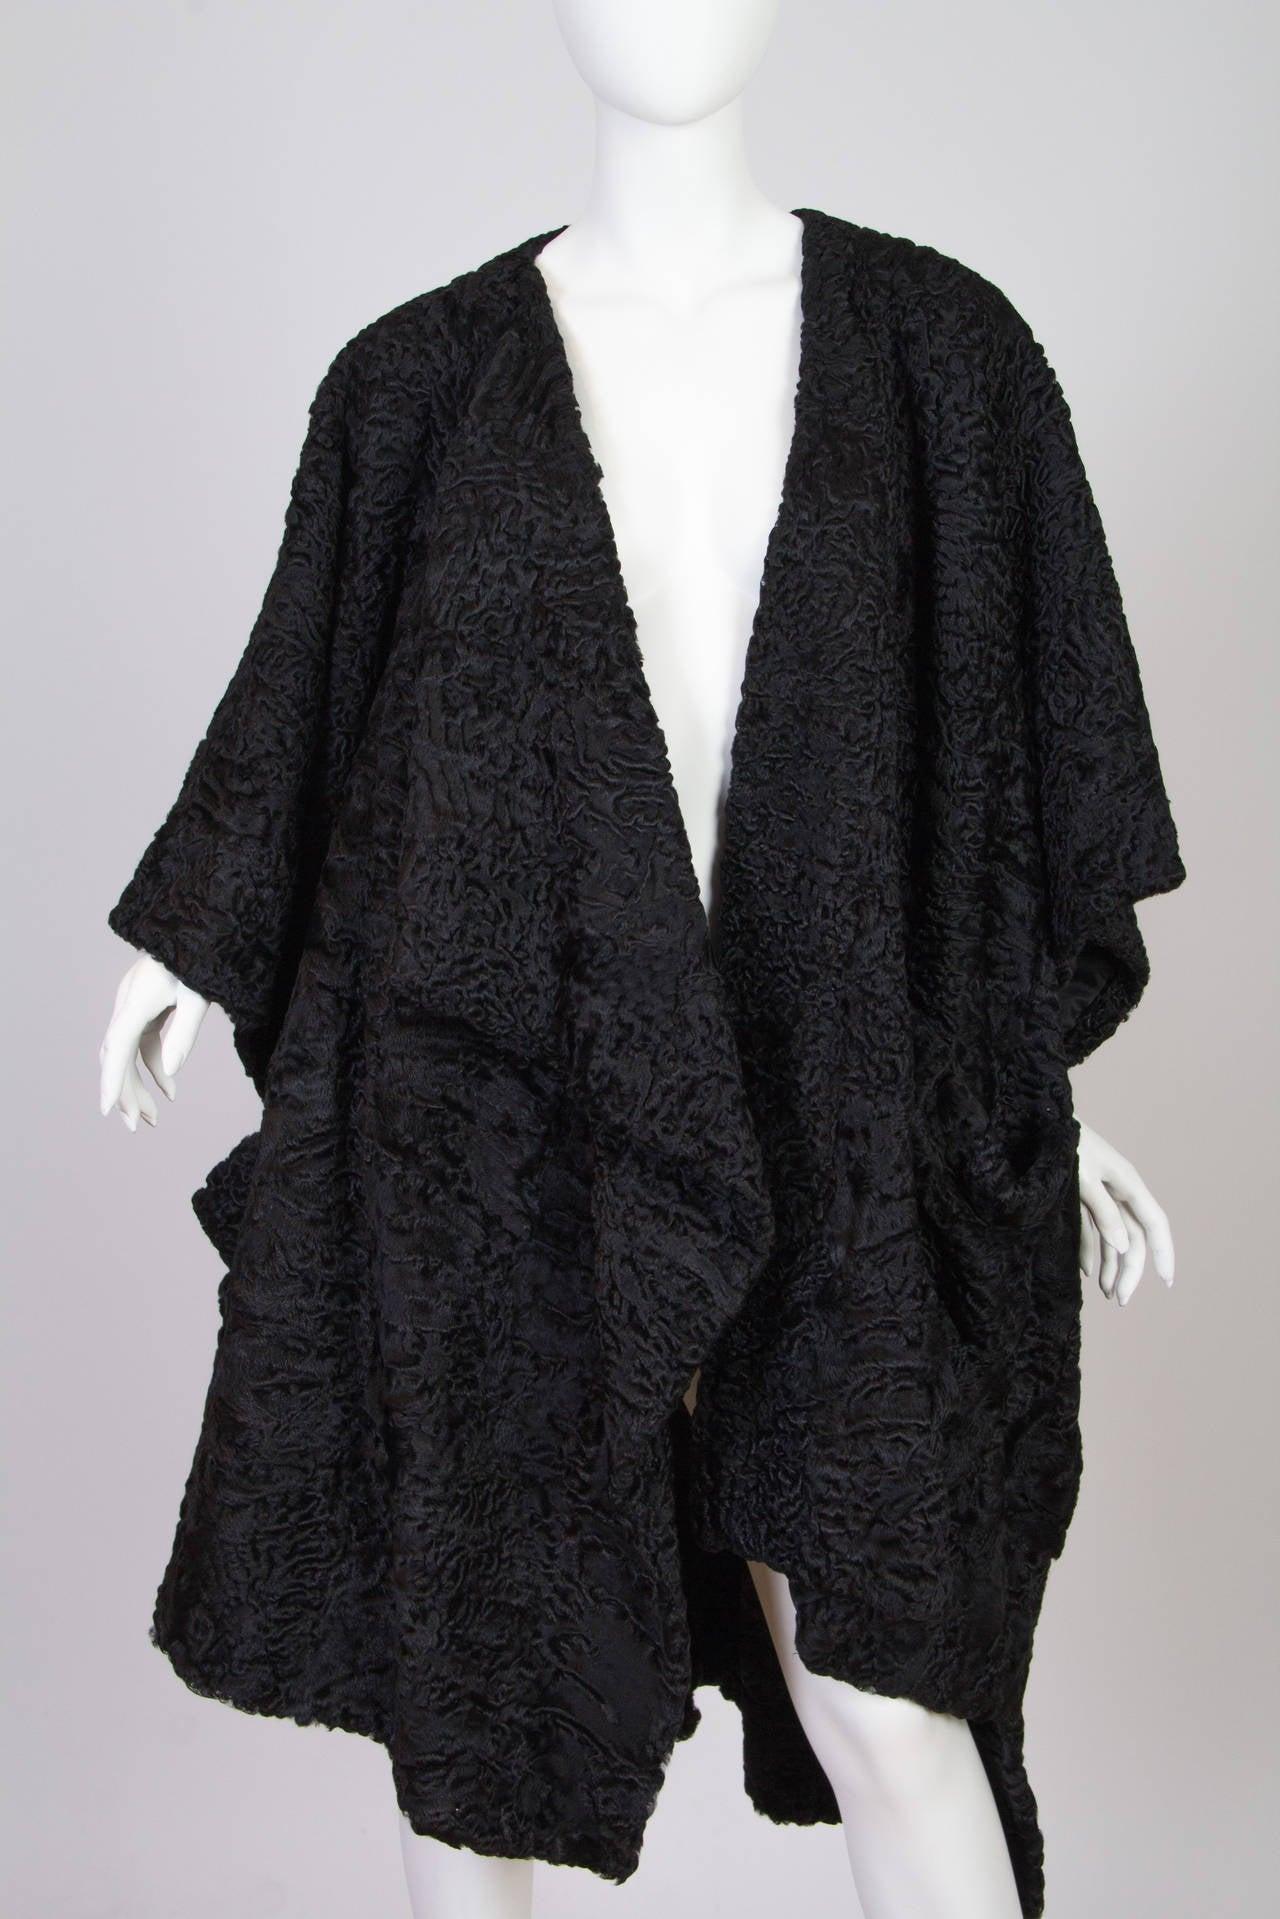 Patrick Kelly Asymetrical Minimalist Black Astrakhan Fur Coat 7